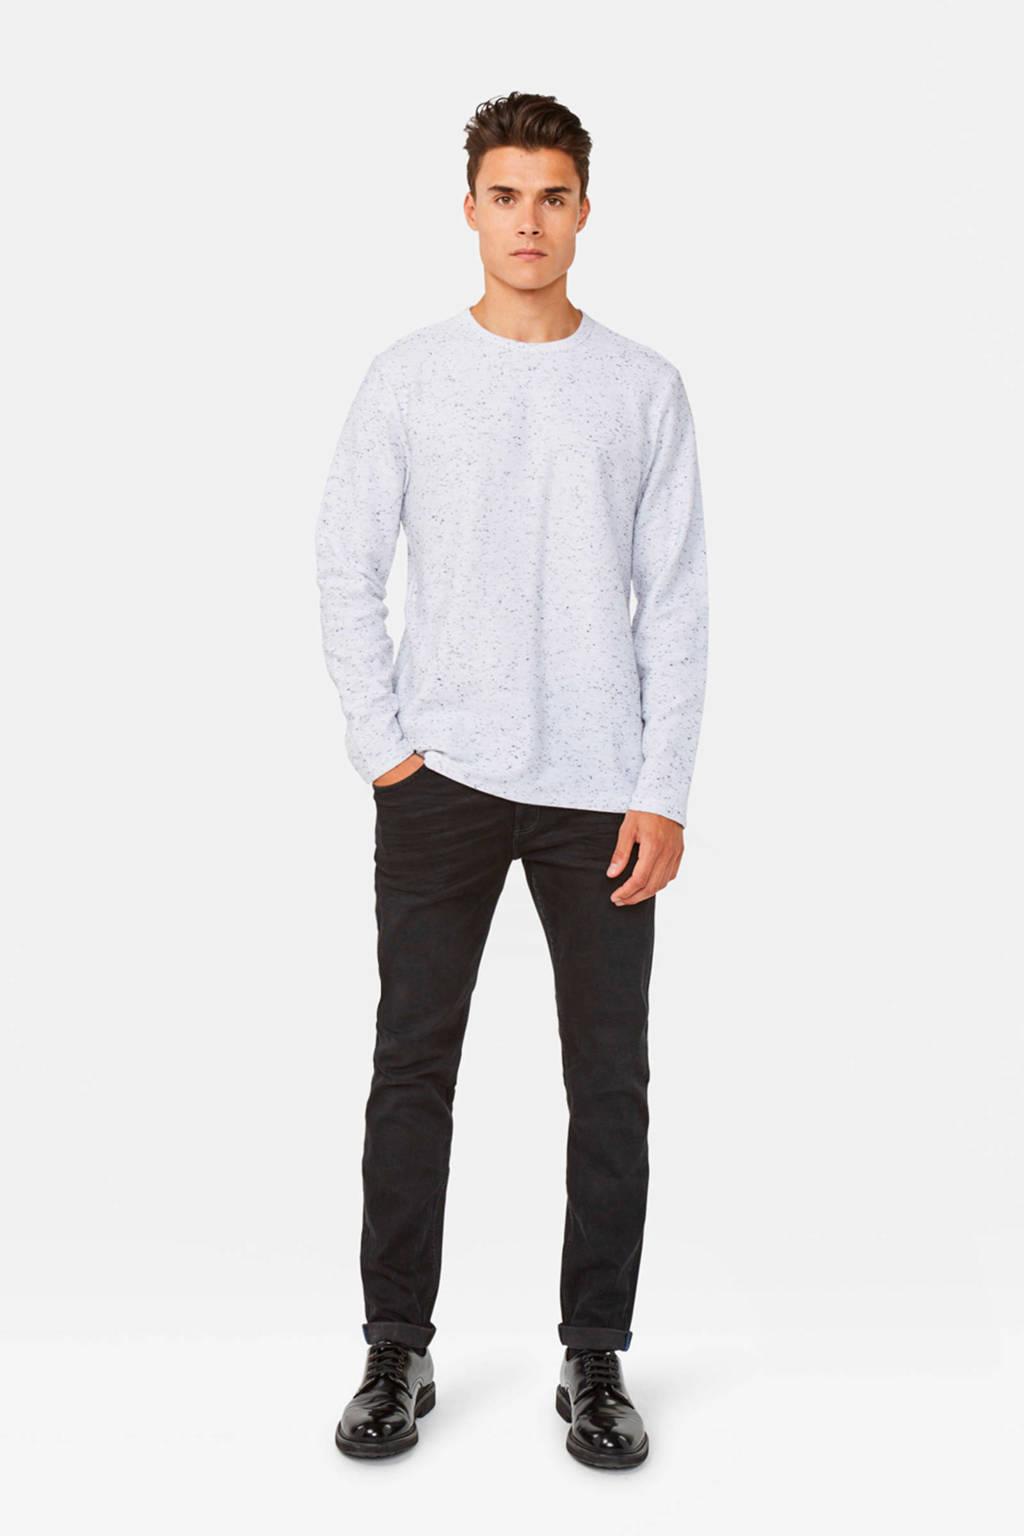 WE Fashion trui lichtgrijs/grijs, Lichtgrijs/grijs